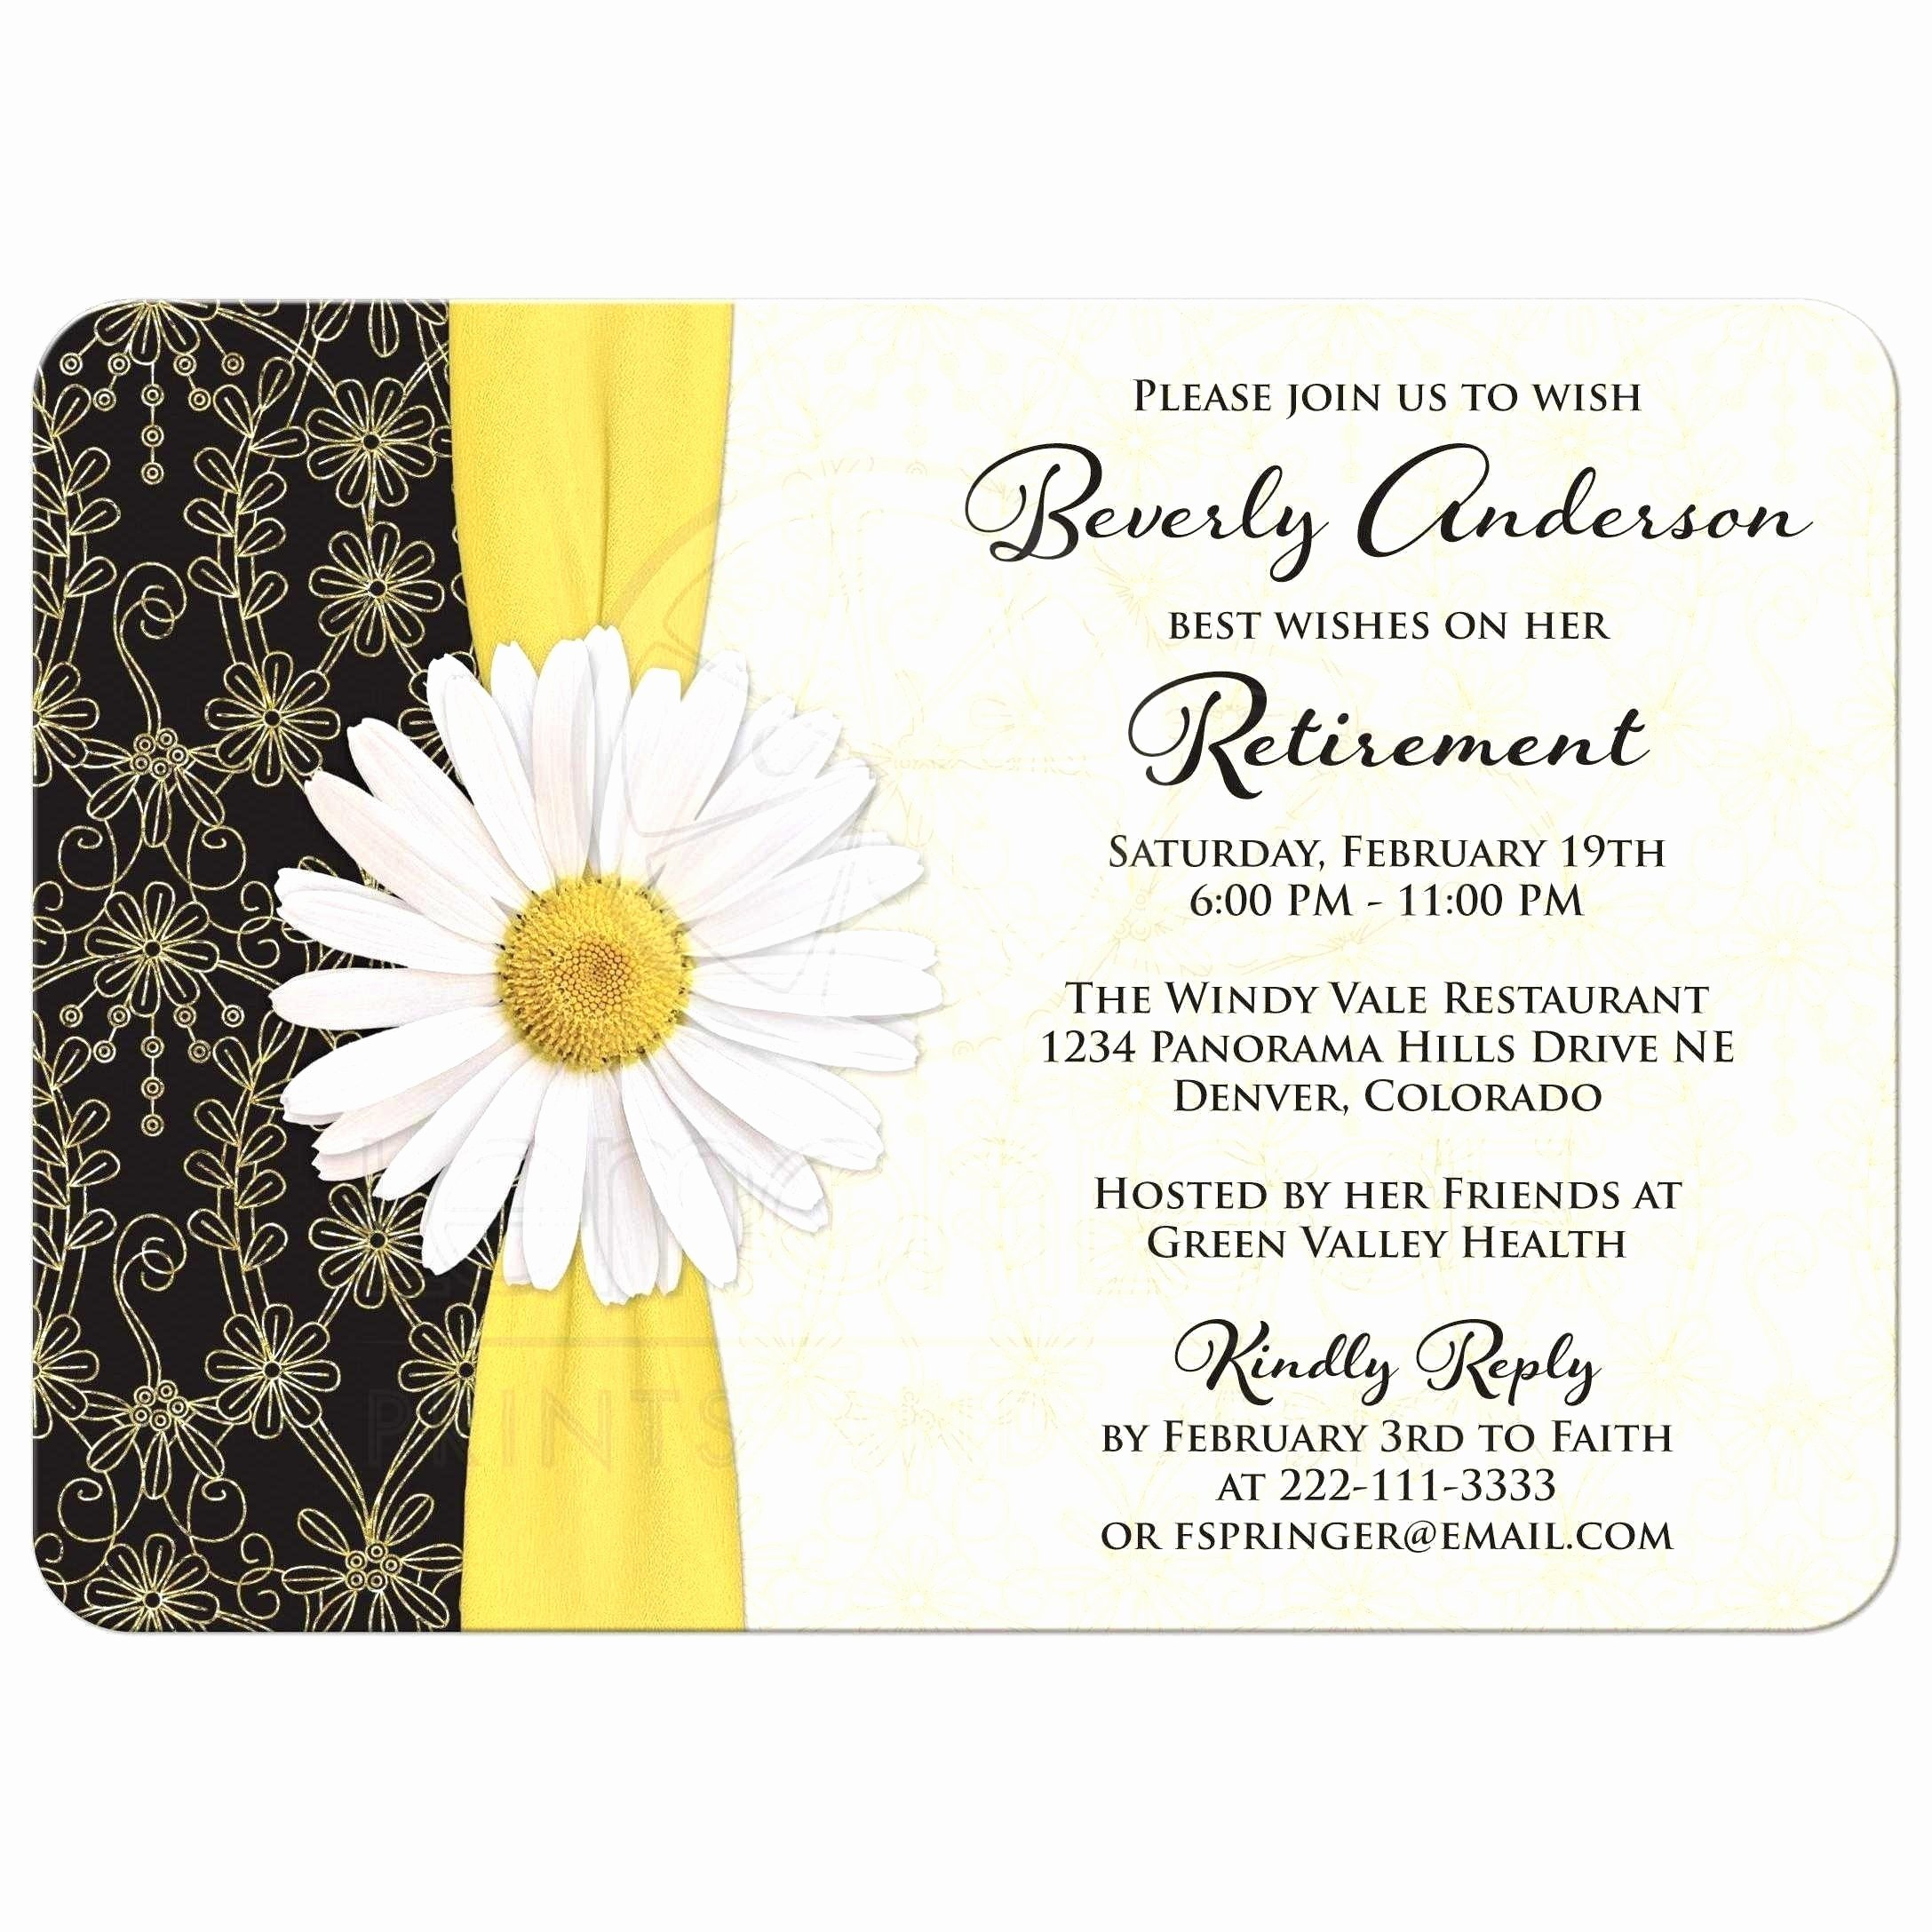 Retirement Invitation Template Free Beautiful Free Invitation Templates for Retirement Party New